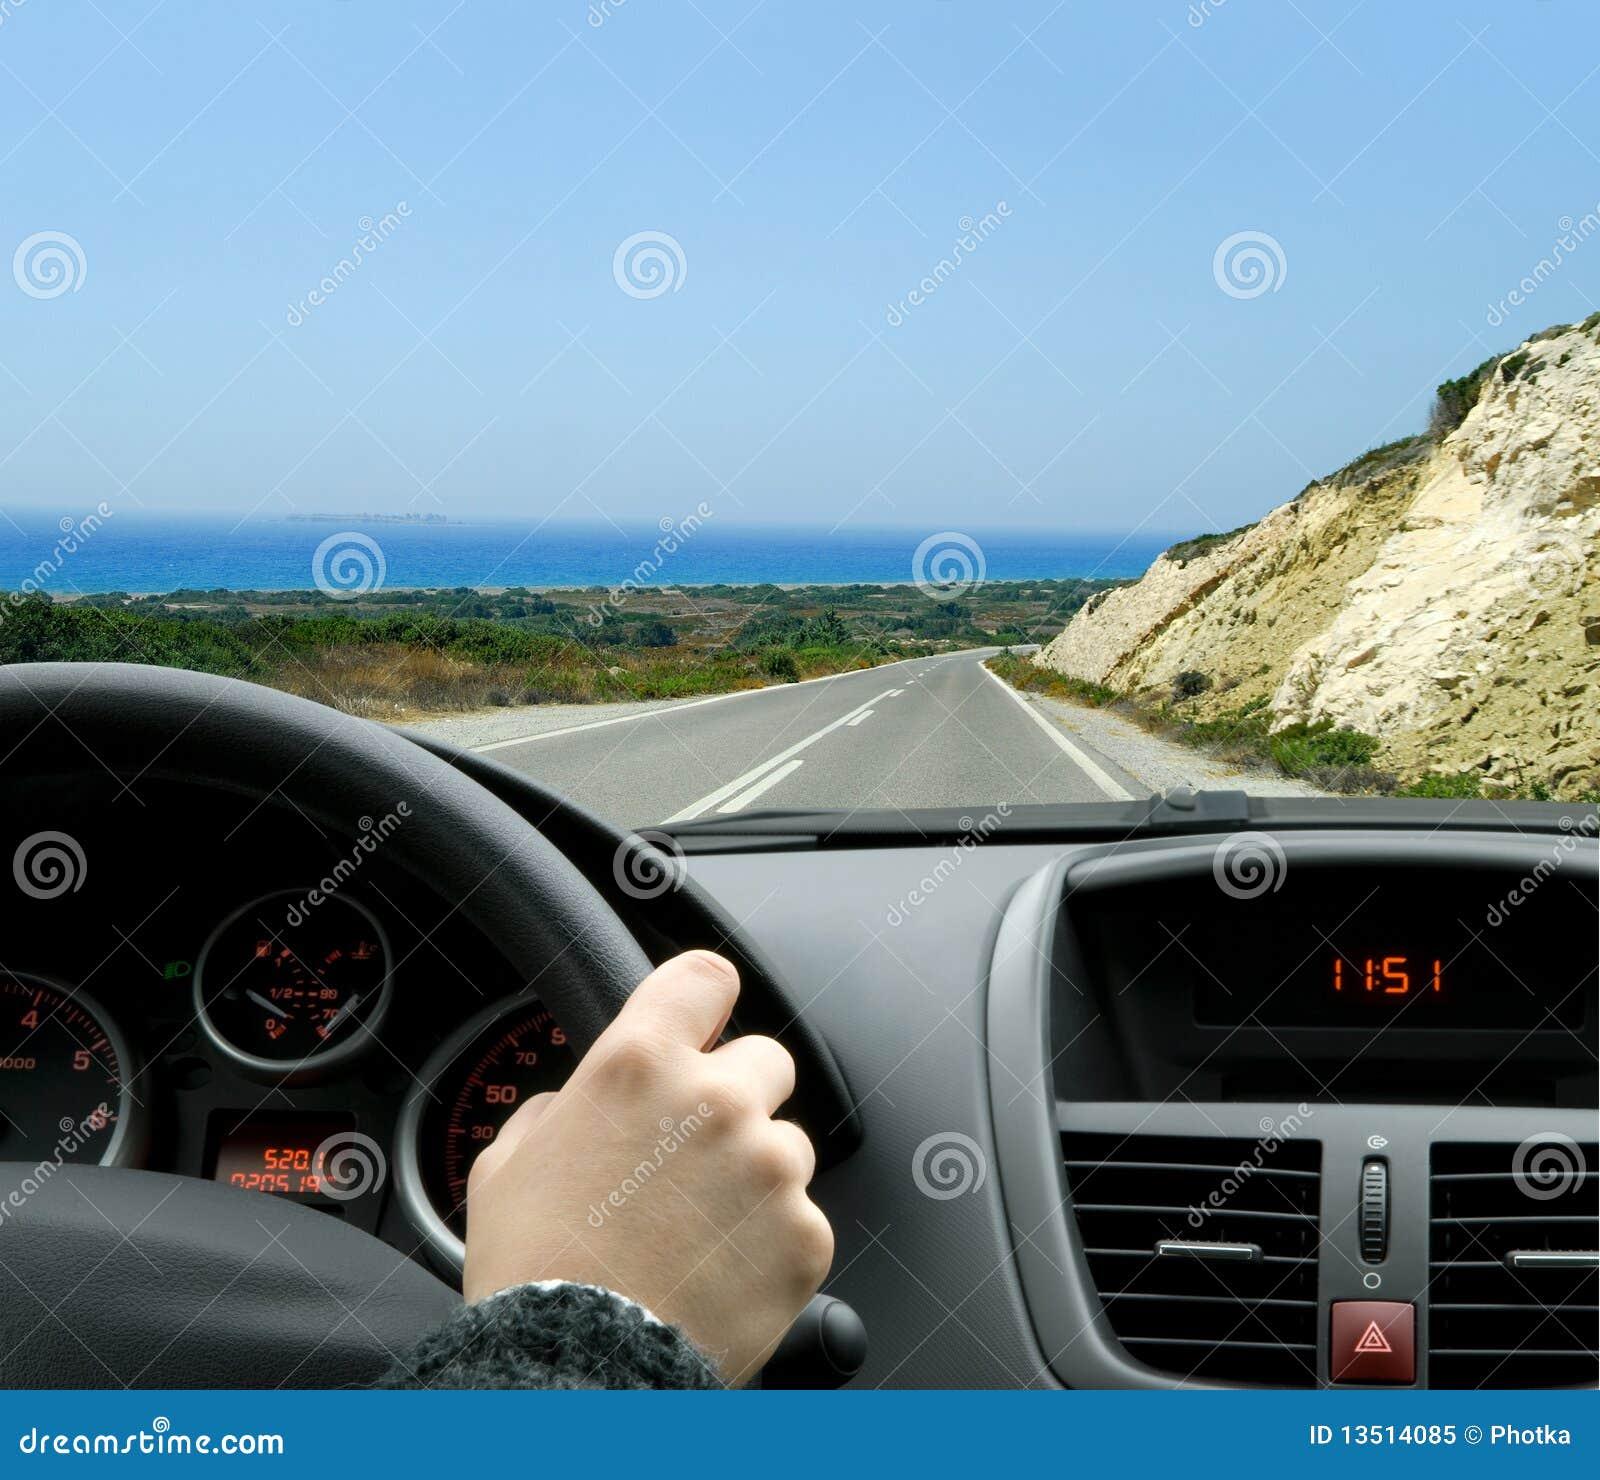 Car Stock Photos: CartoonDealer.com #18432150